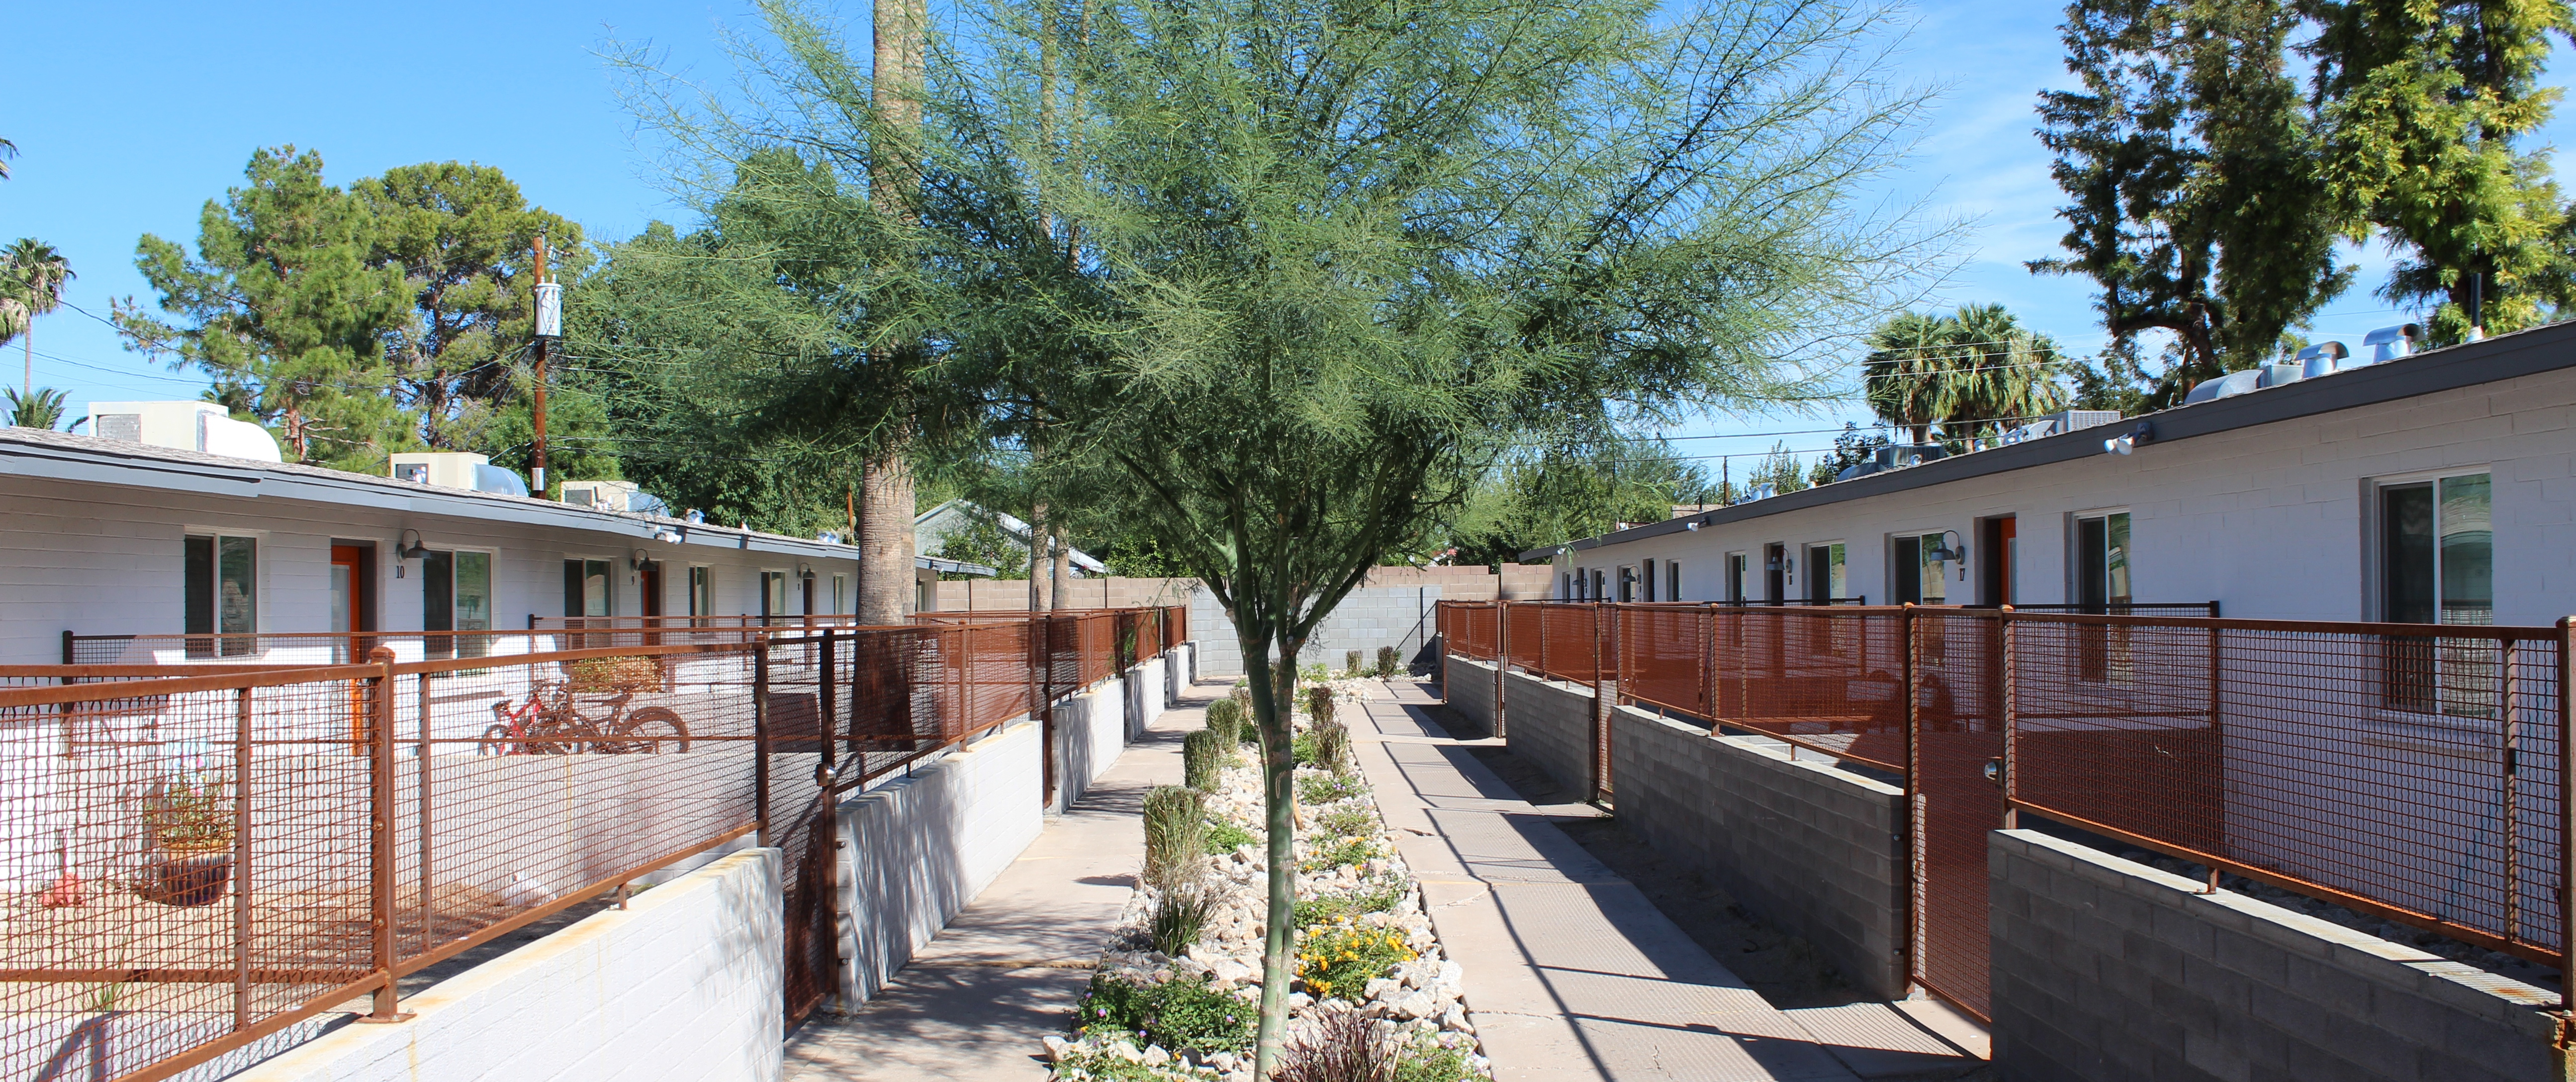 MODE Biltmore @ 27th Street N | 4231-4237 N 27th St, Phoenix, AZ 85016